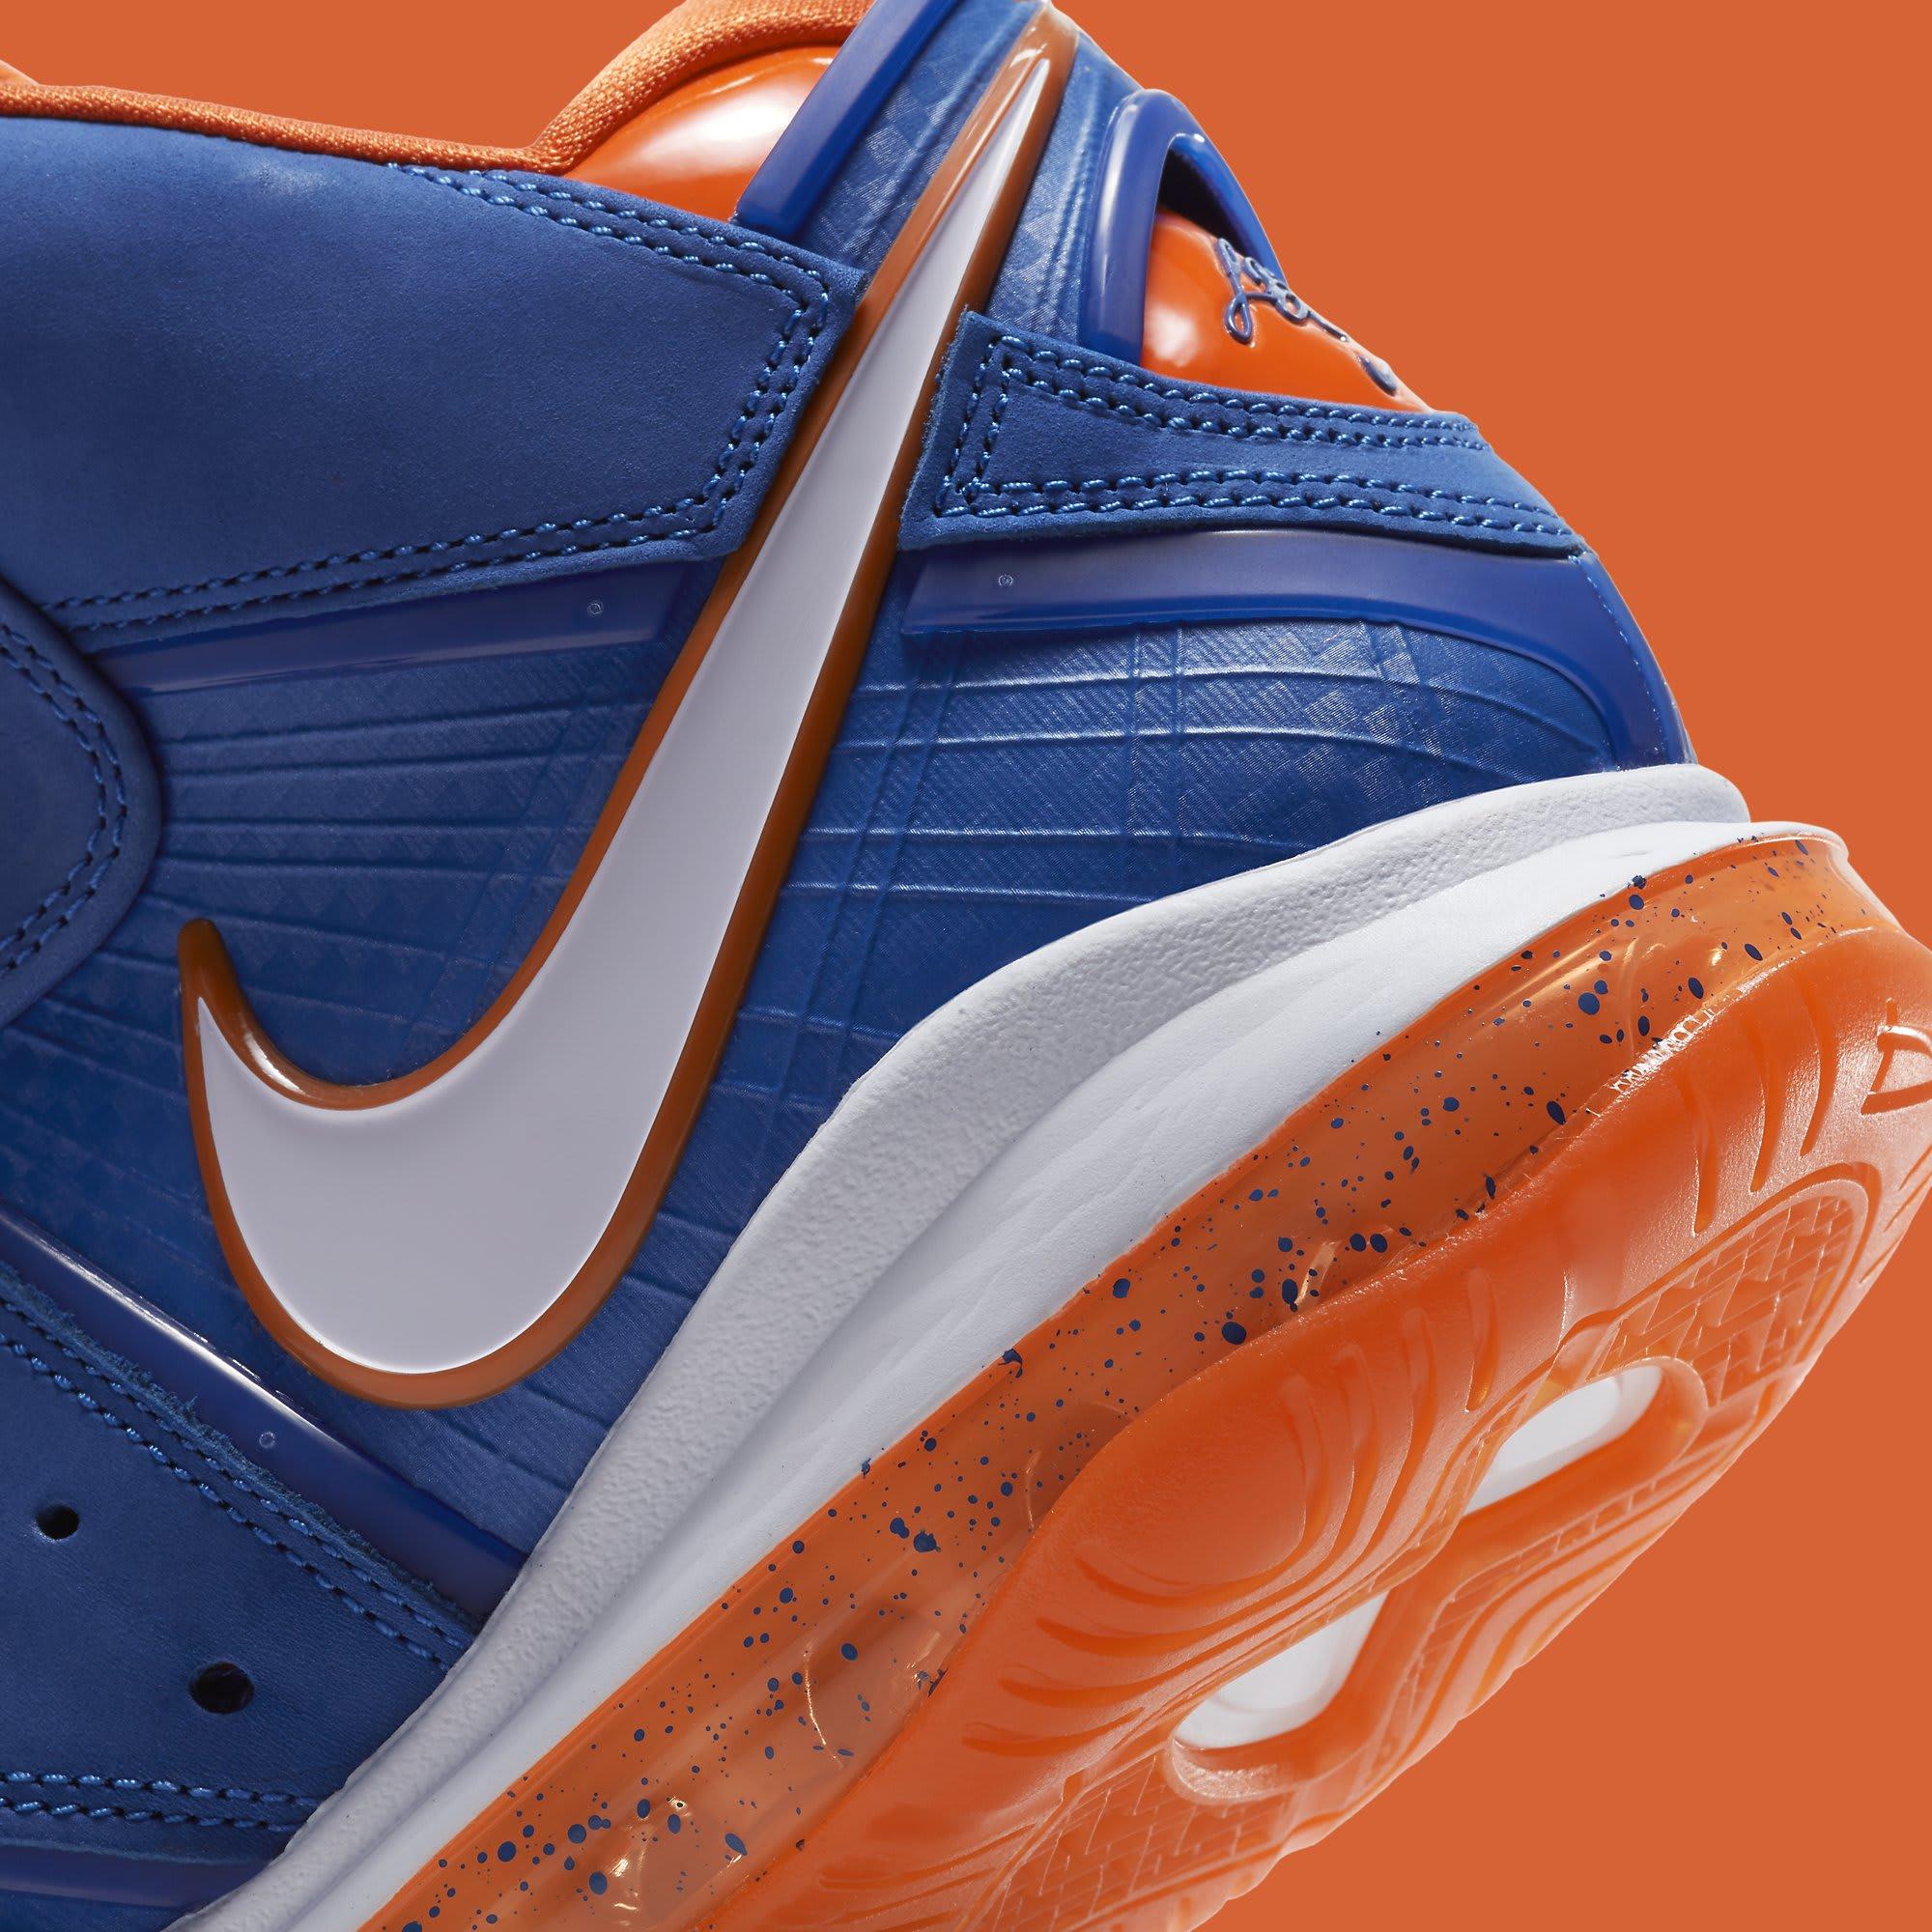 Nike LeBron 8 'HWC' CV1750-400 Heel